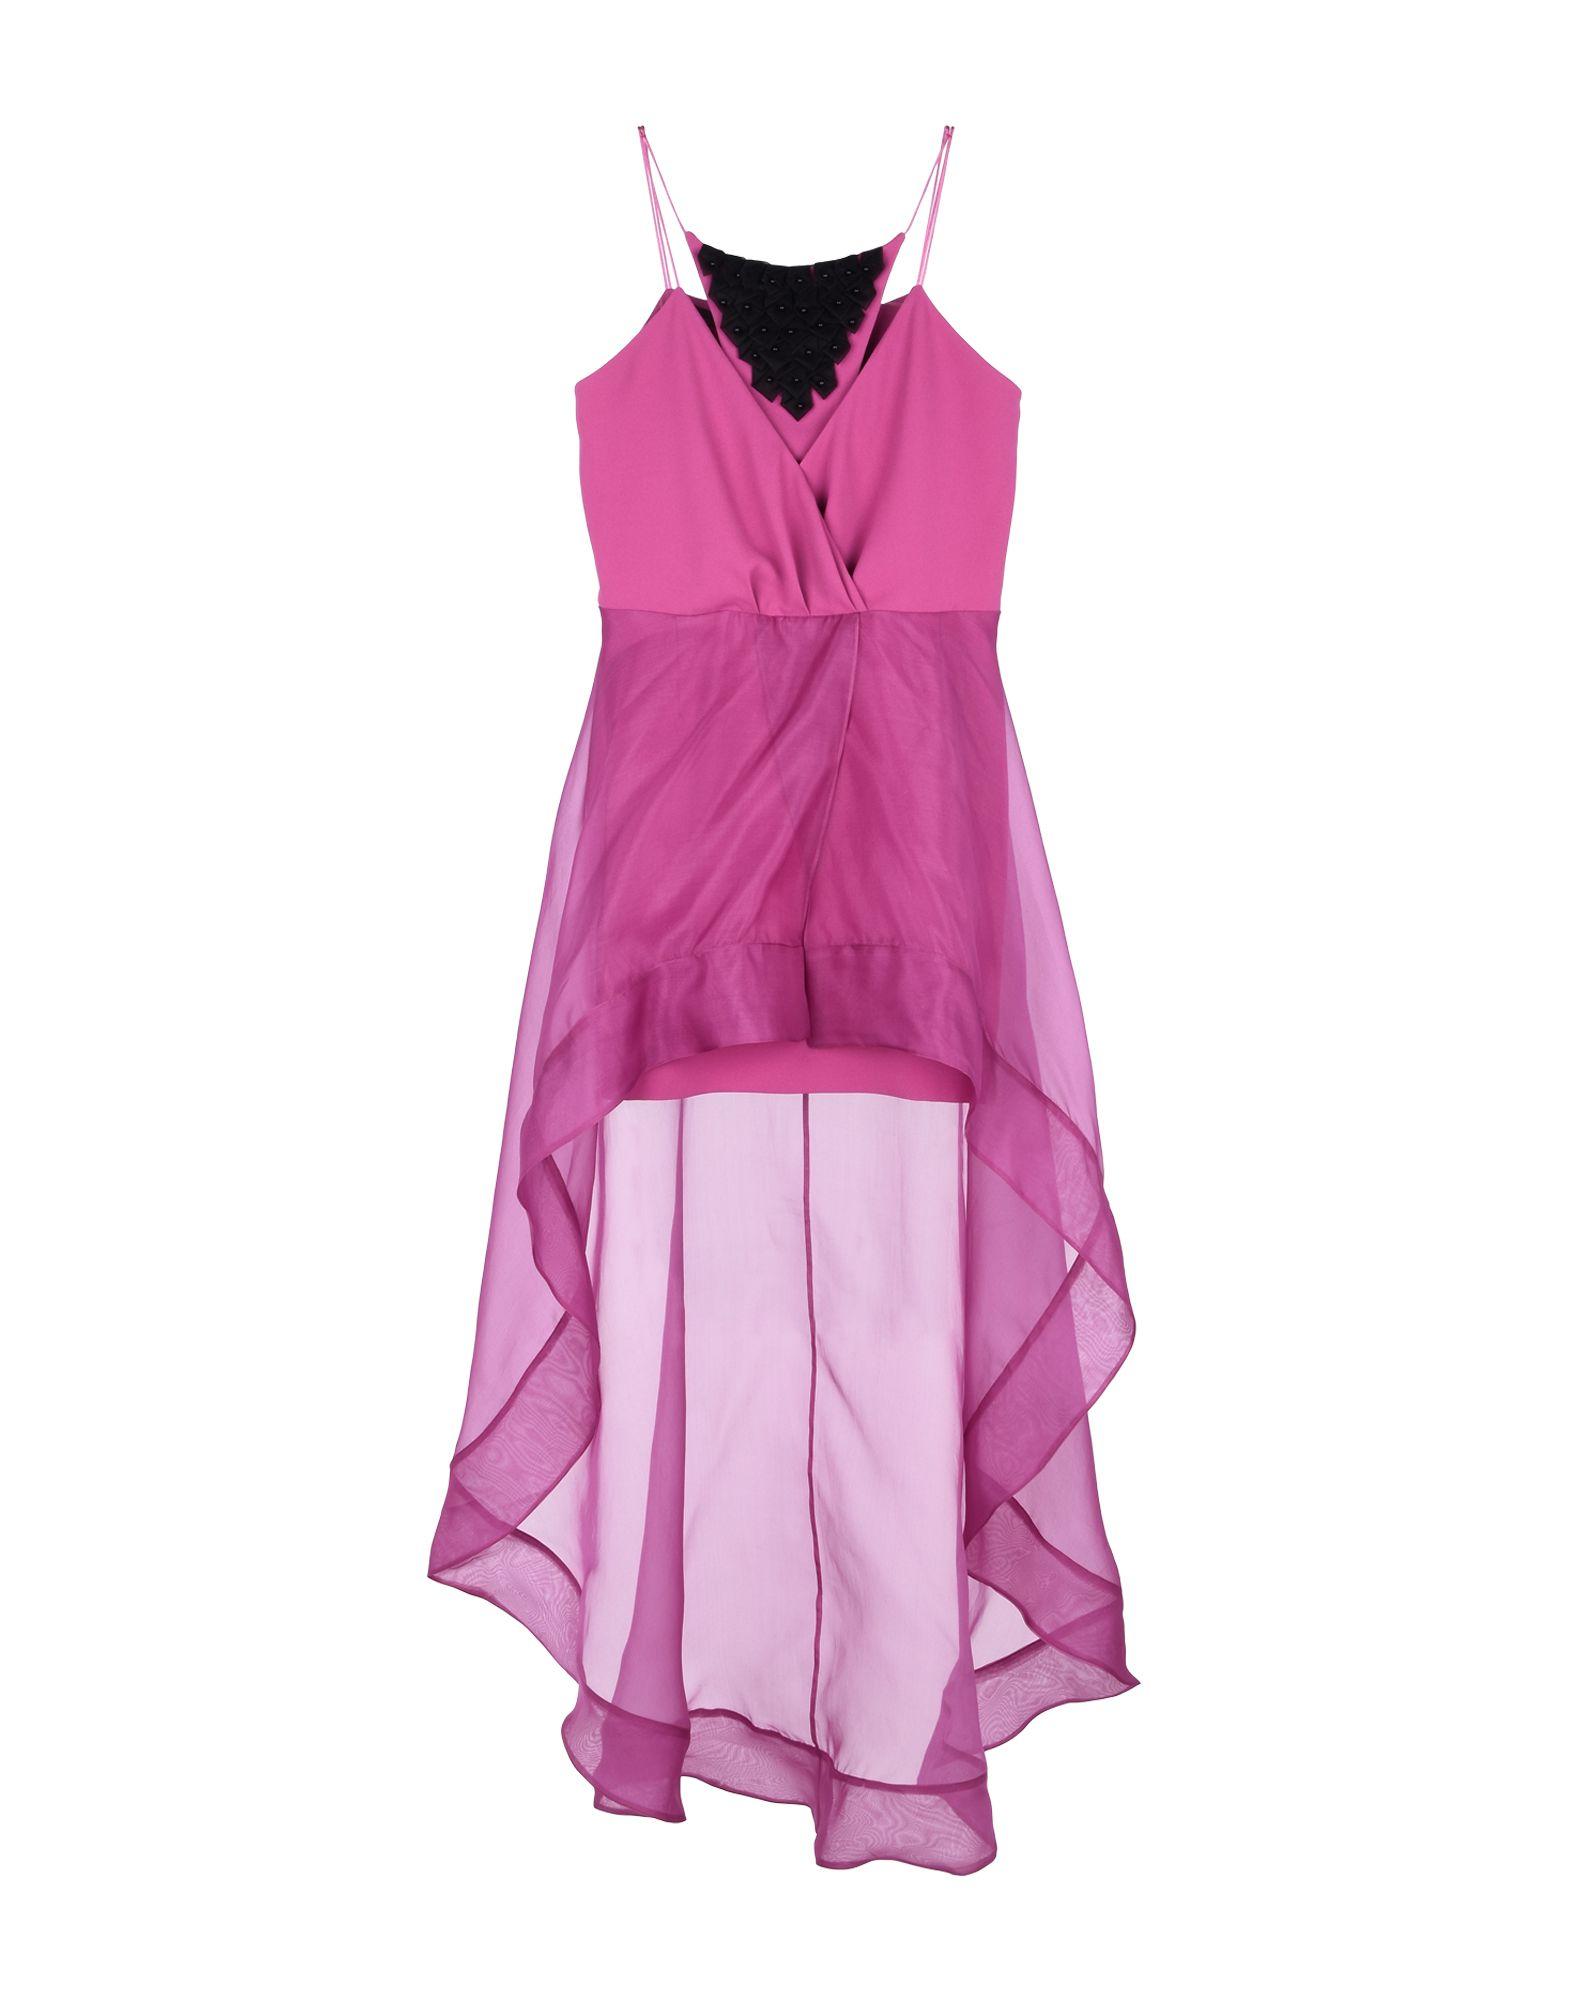 HH COUTURE Короткое платье hhtx 20 145 435 hh s518 sma walkie talkie baofeng 3r 985 wouxun kg uv8d yaesu hh s518